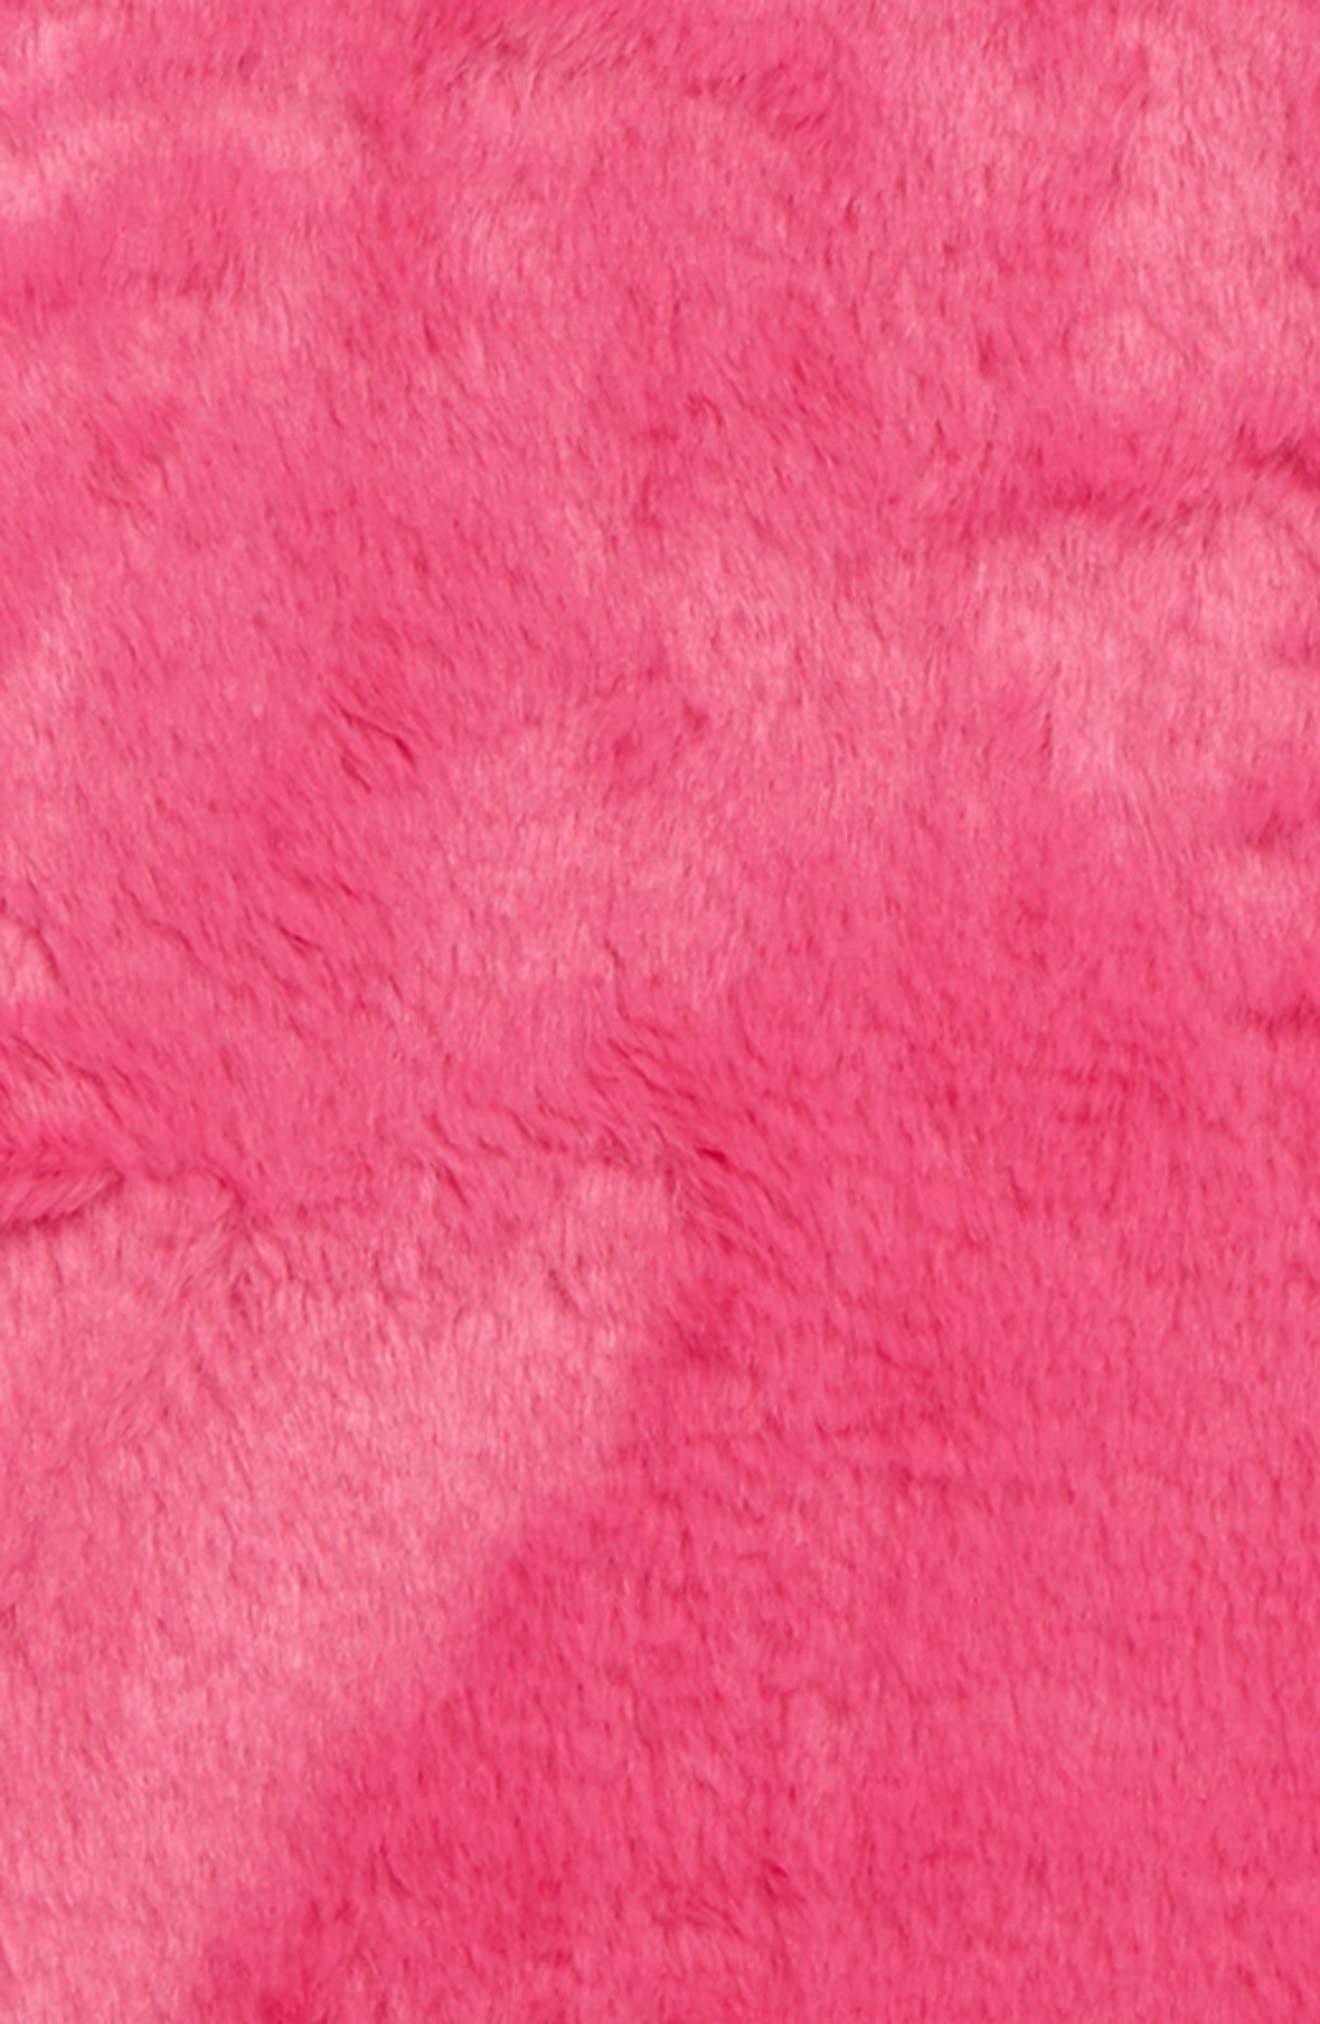 Faux Fur Tunic,                             Alternate thumbnail 2, color,                             PINK MAGENTA